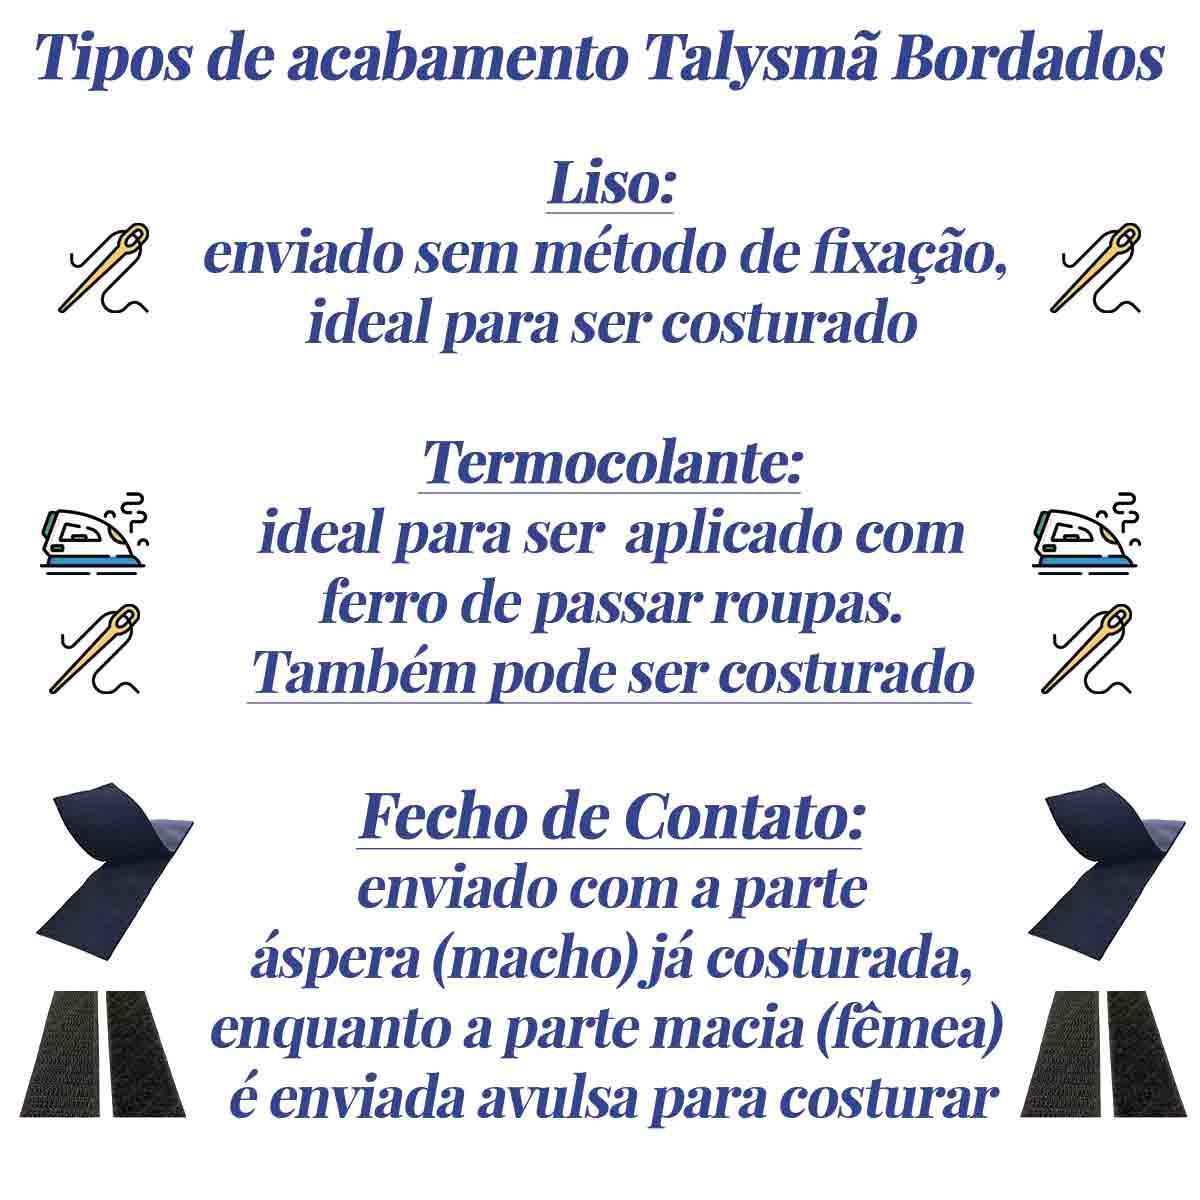 Patch Bordado - Letras Alfabeto Letra x DV80537-419  - Talysmã Bordados